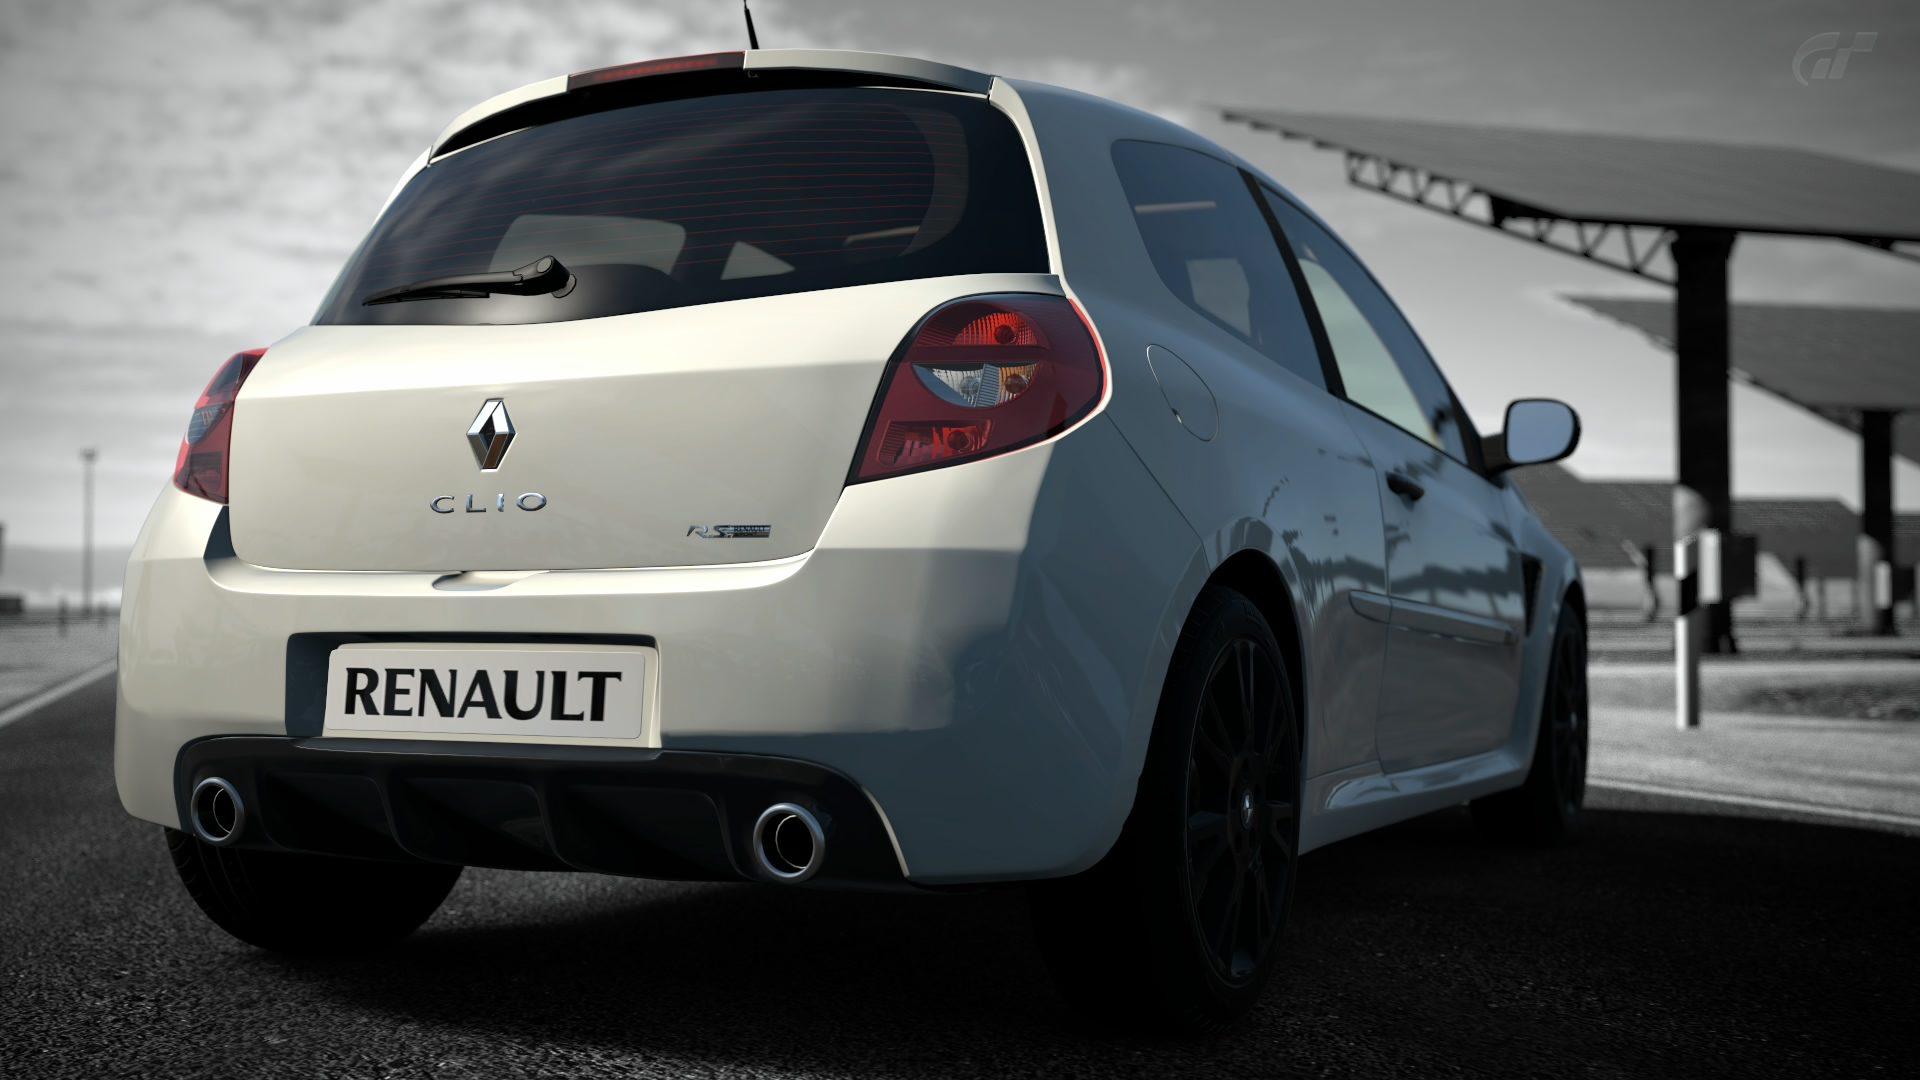 2011 Renault Sport Clio R.S. - #003.jpg